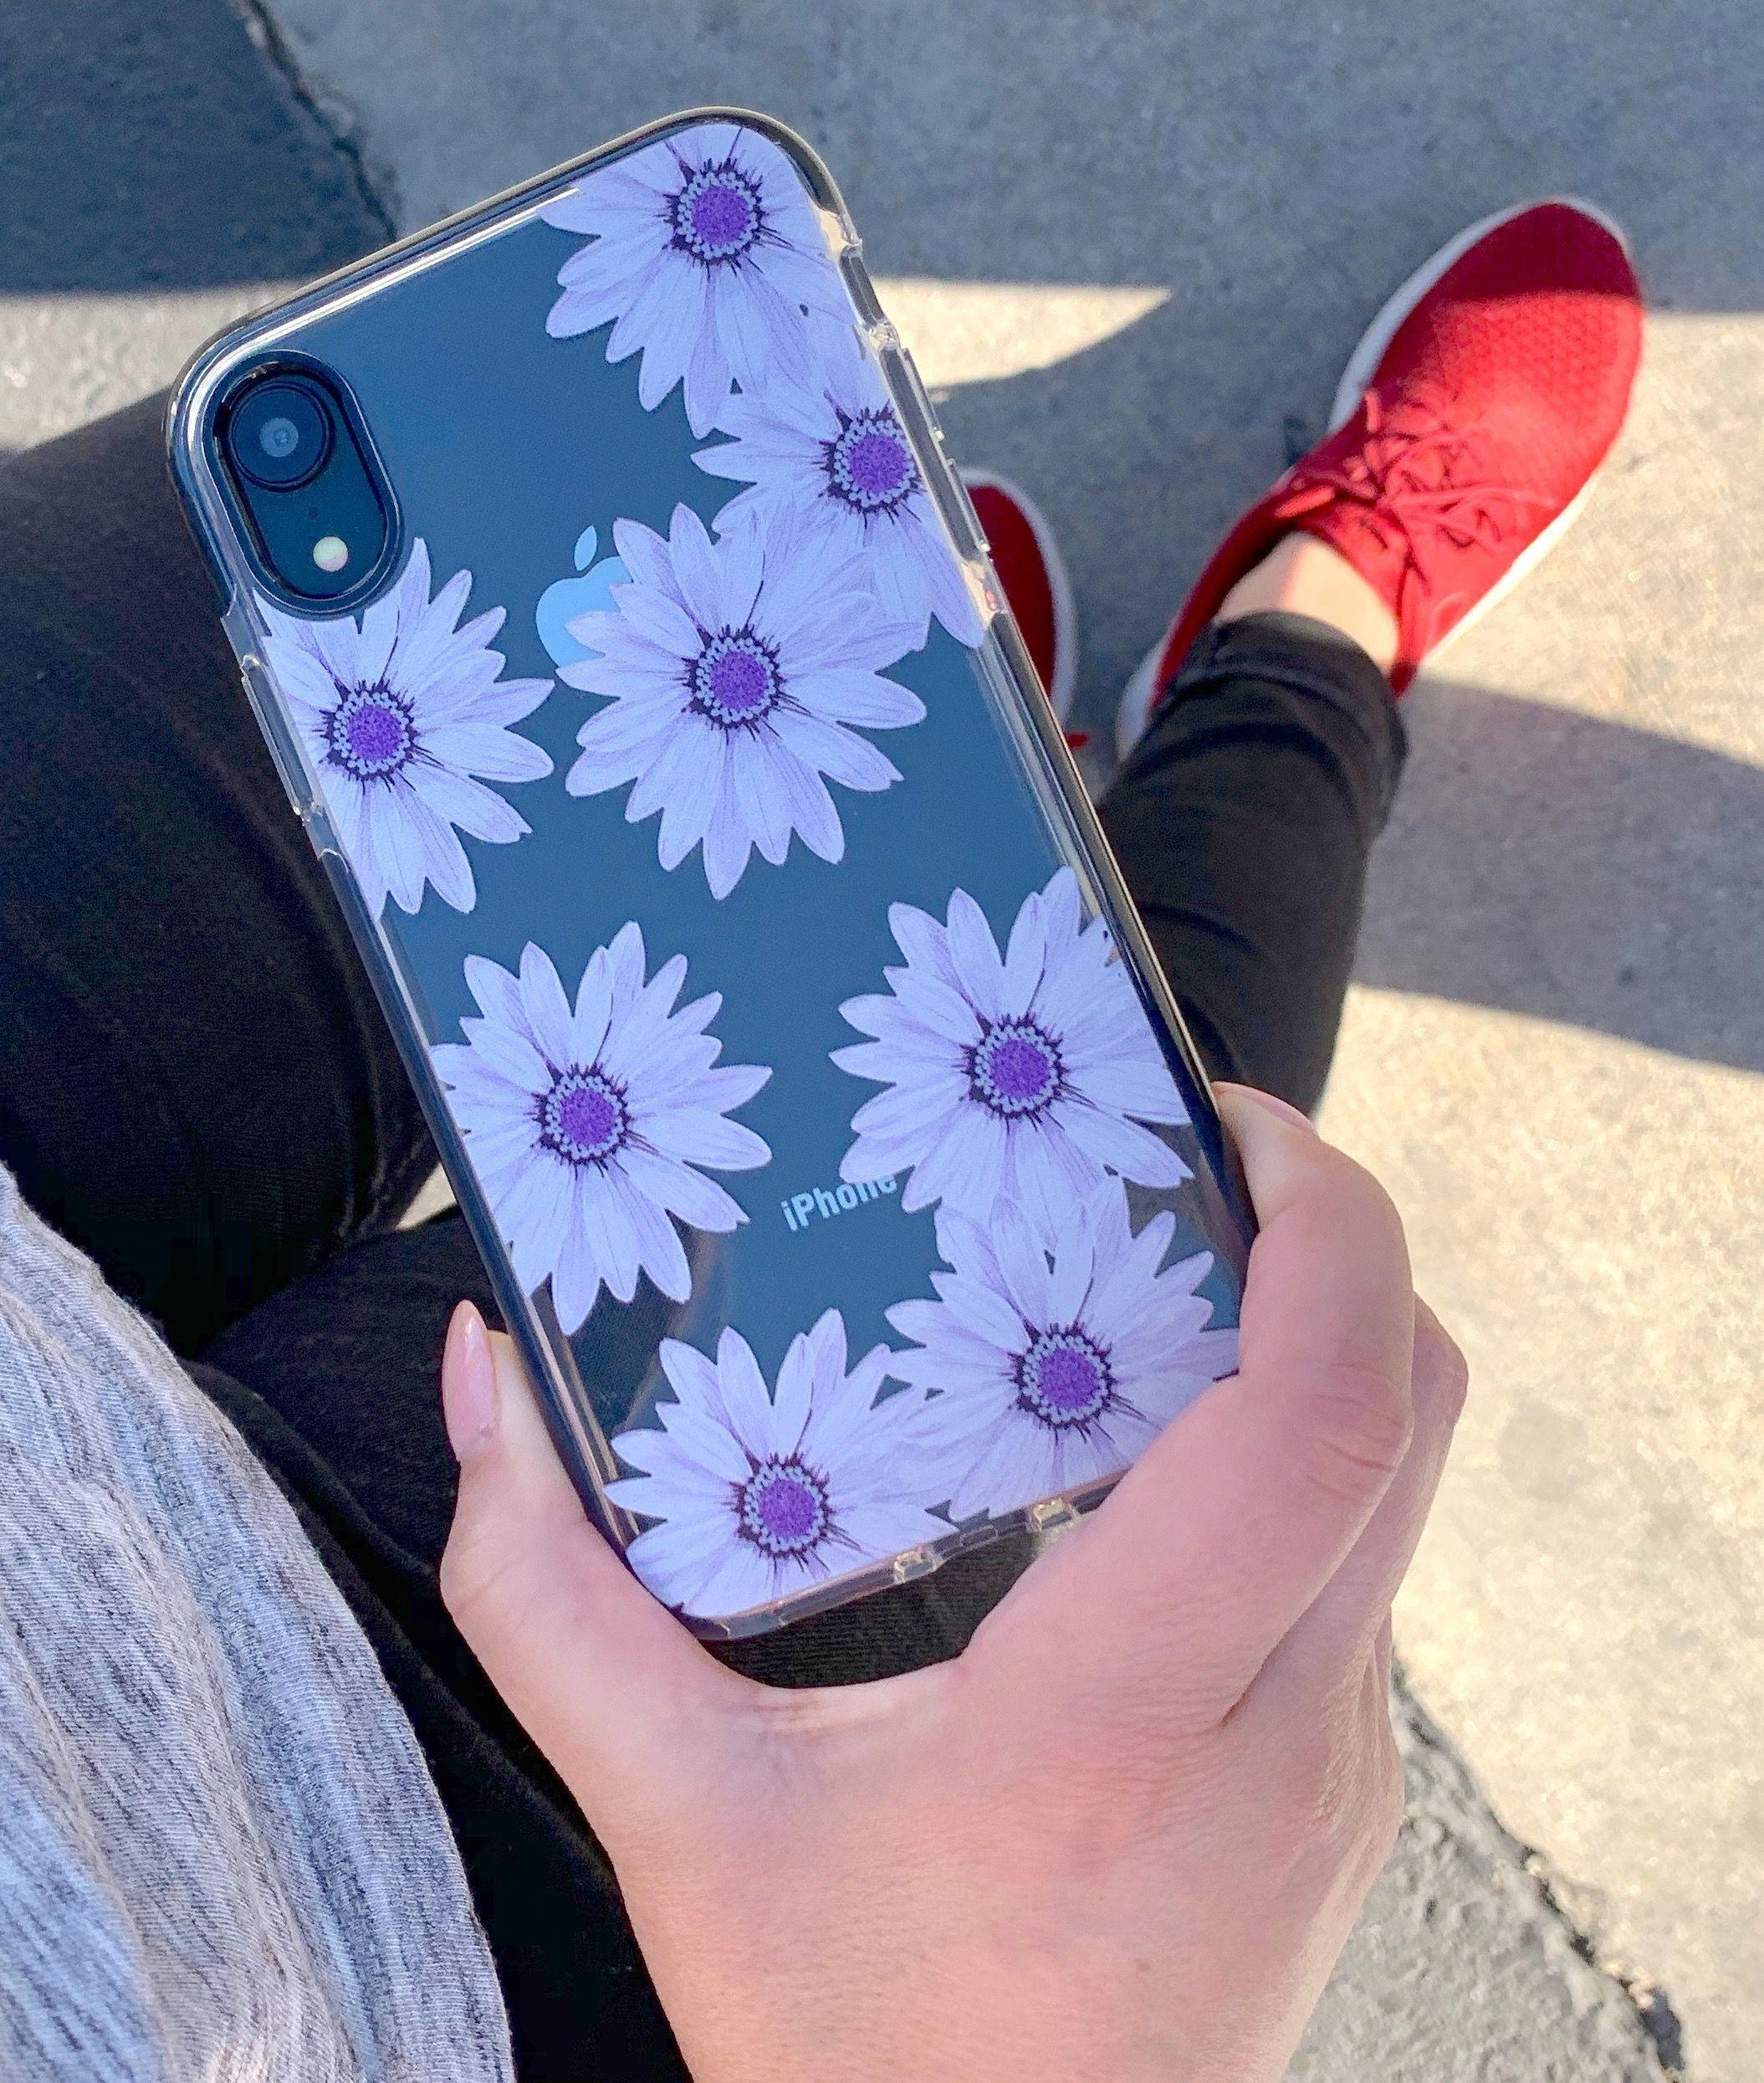 15 Splendid Phone Case Zte Zfive C Lte Phone Cases That